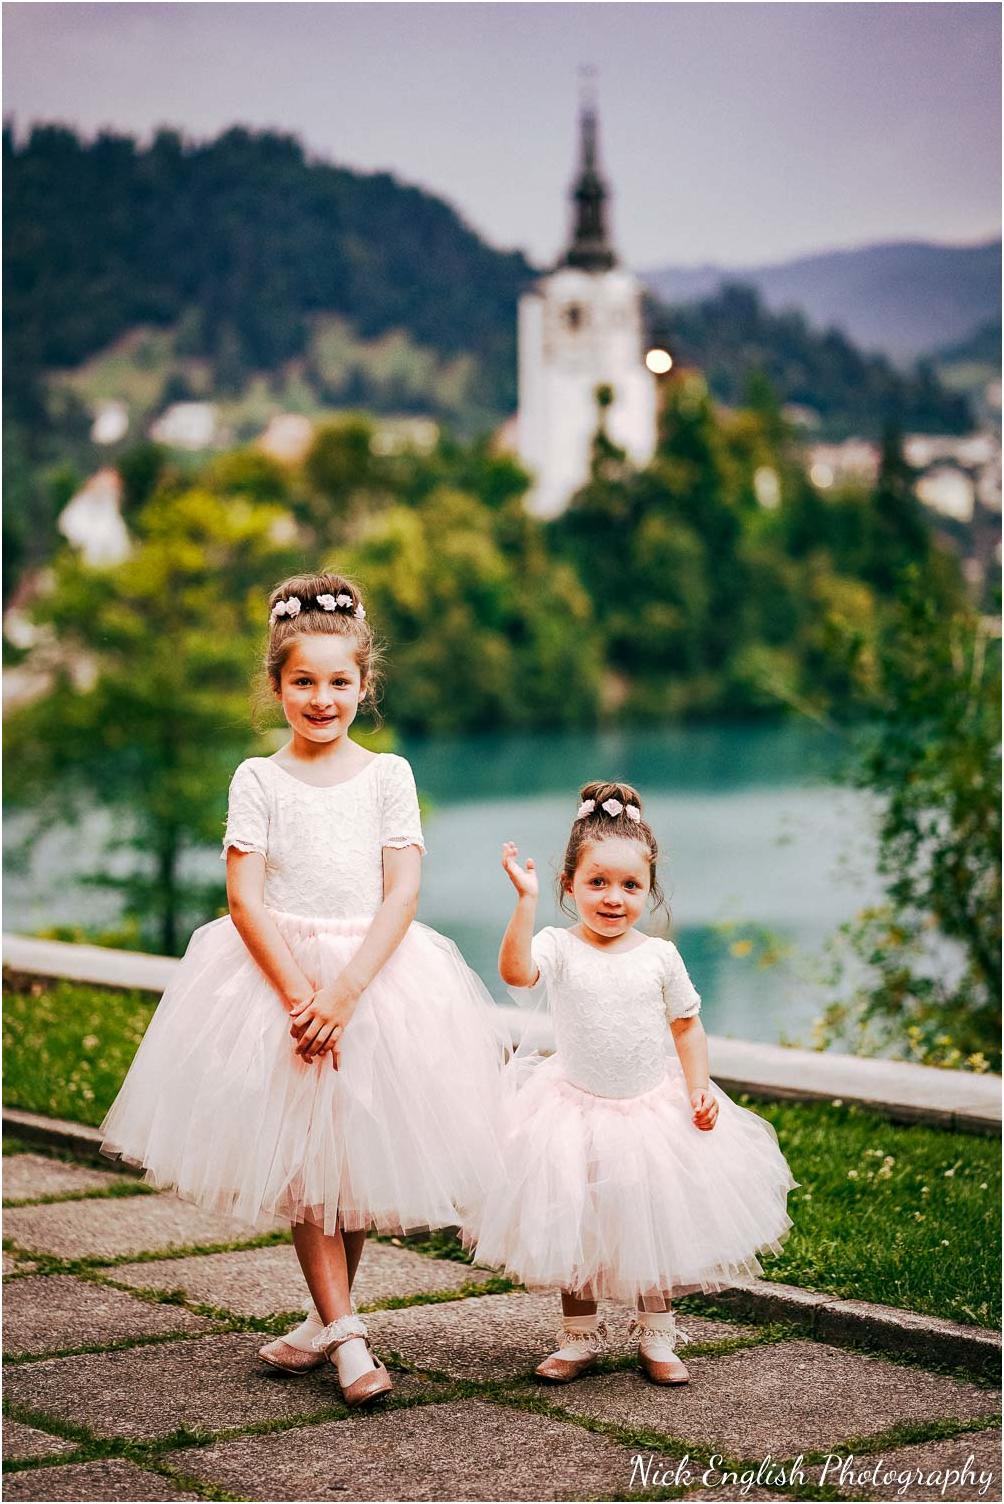 Destination_Wedding_Photographer_Slovenia_Nick_English_Photography-90.jpg